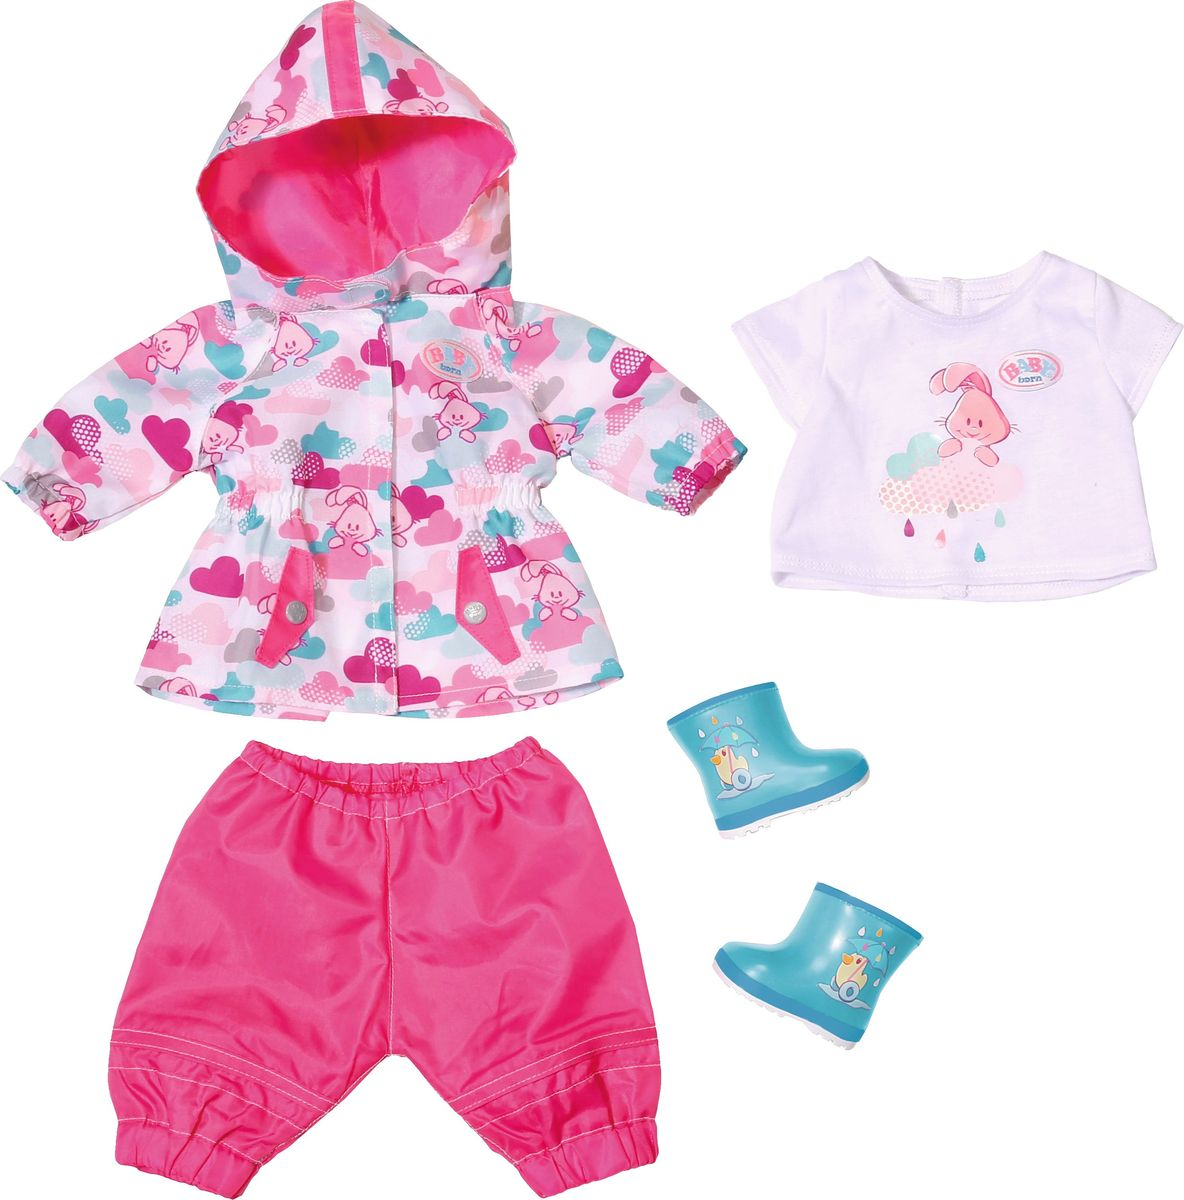 Baby Born Одежда для дождливой погоды baby born одежда для дождливой погоды